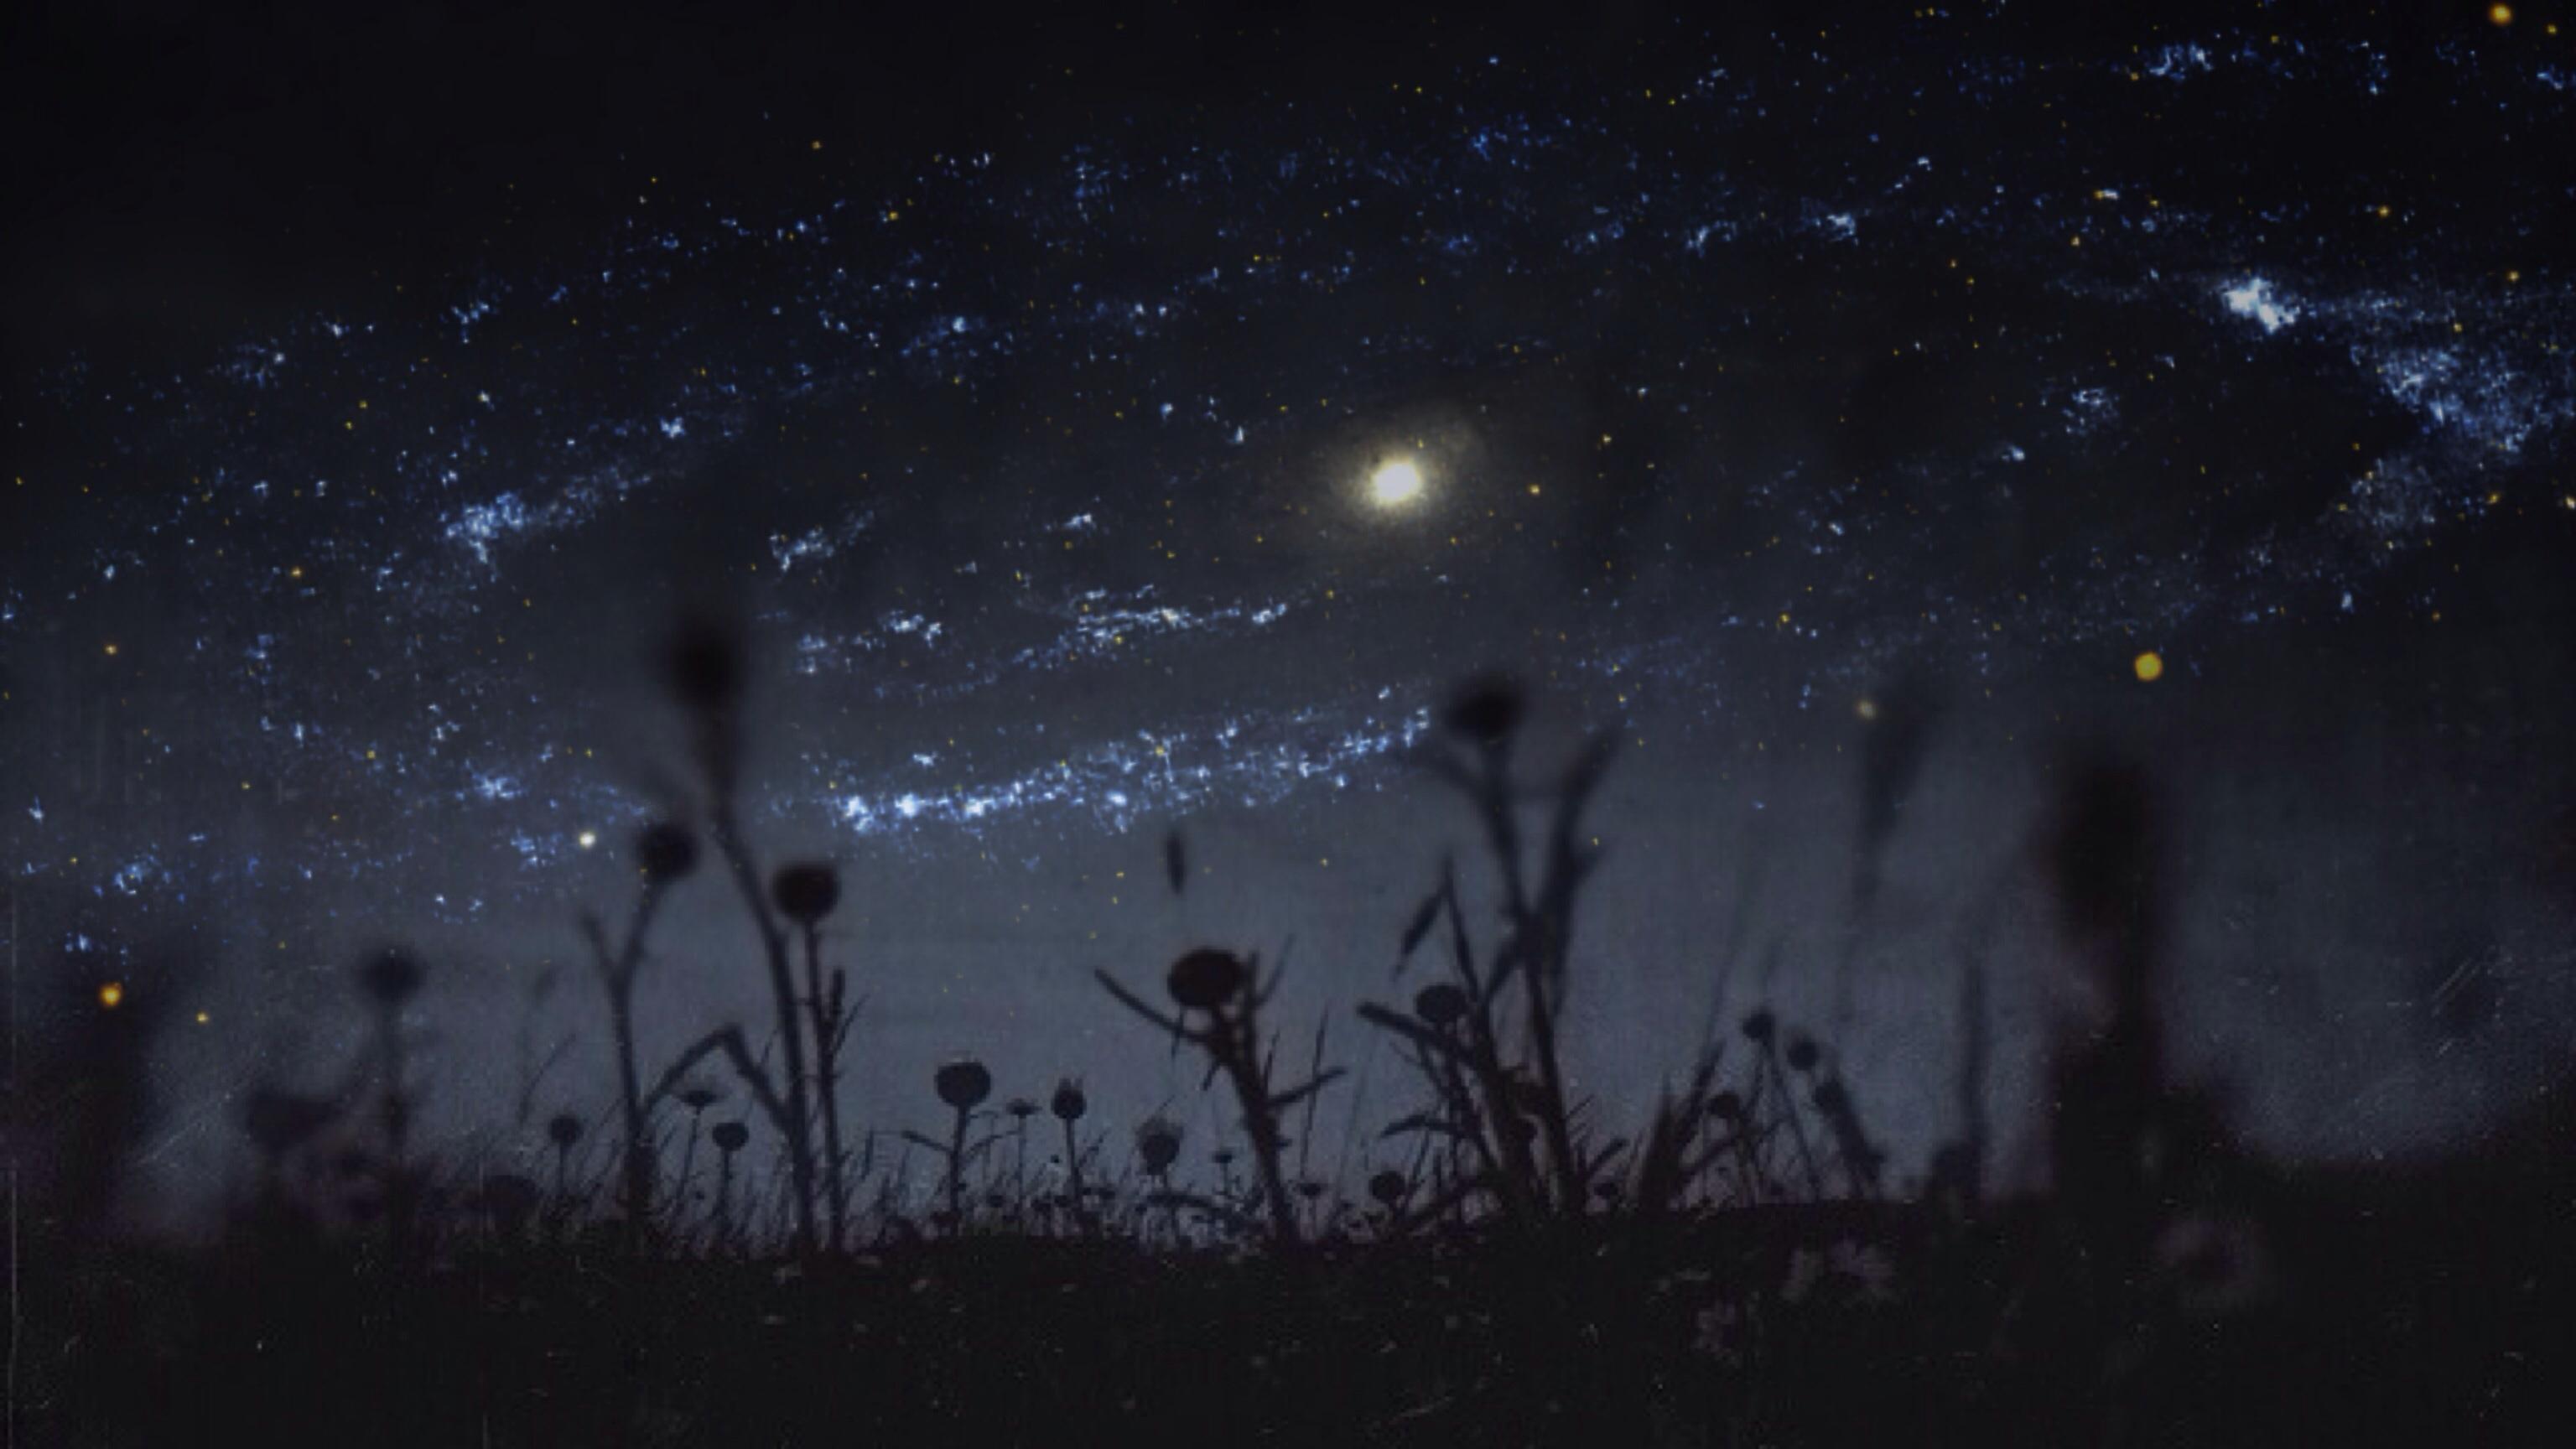 Sky Night Stars Dreamy Wildflowers Tadaa IPhone Atic Galazy Aliensky Pixlromatic Mextures